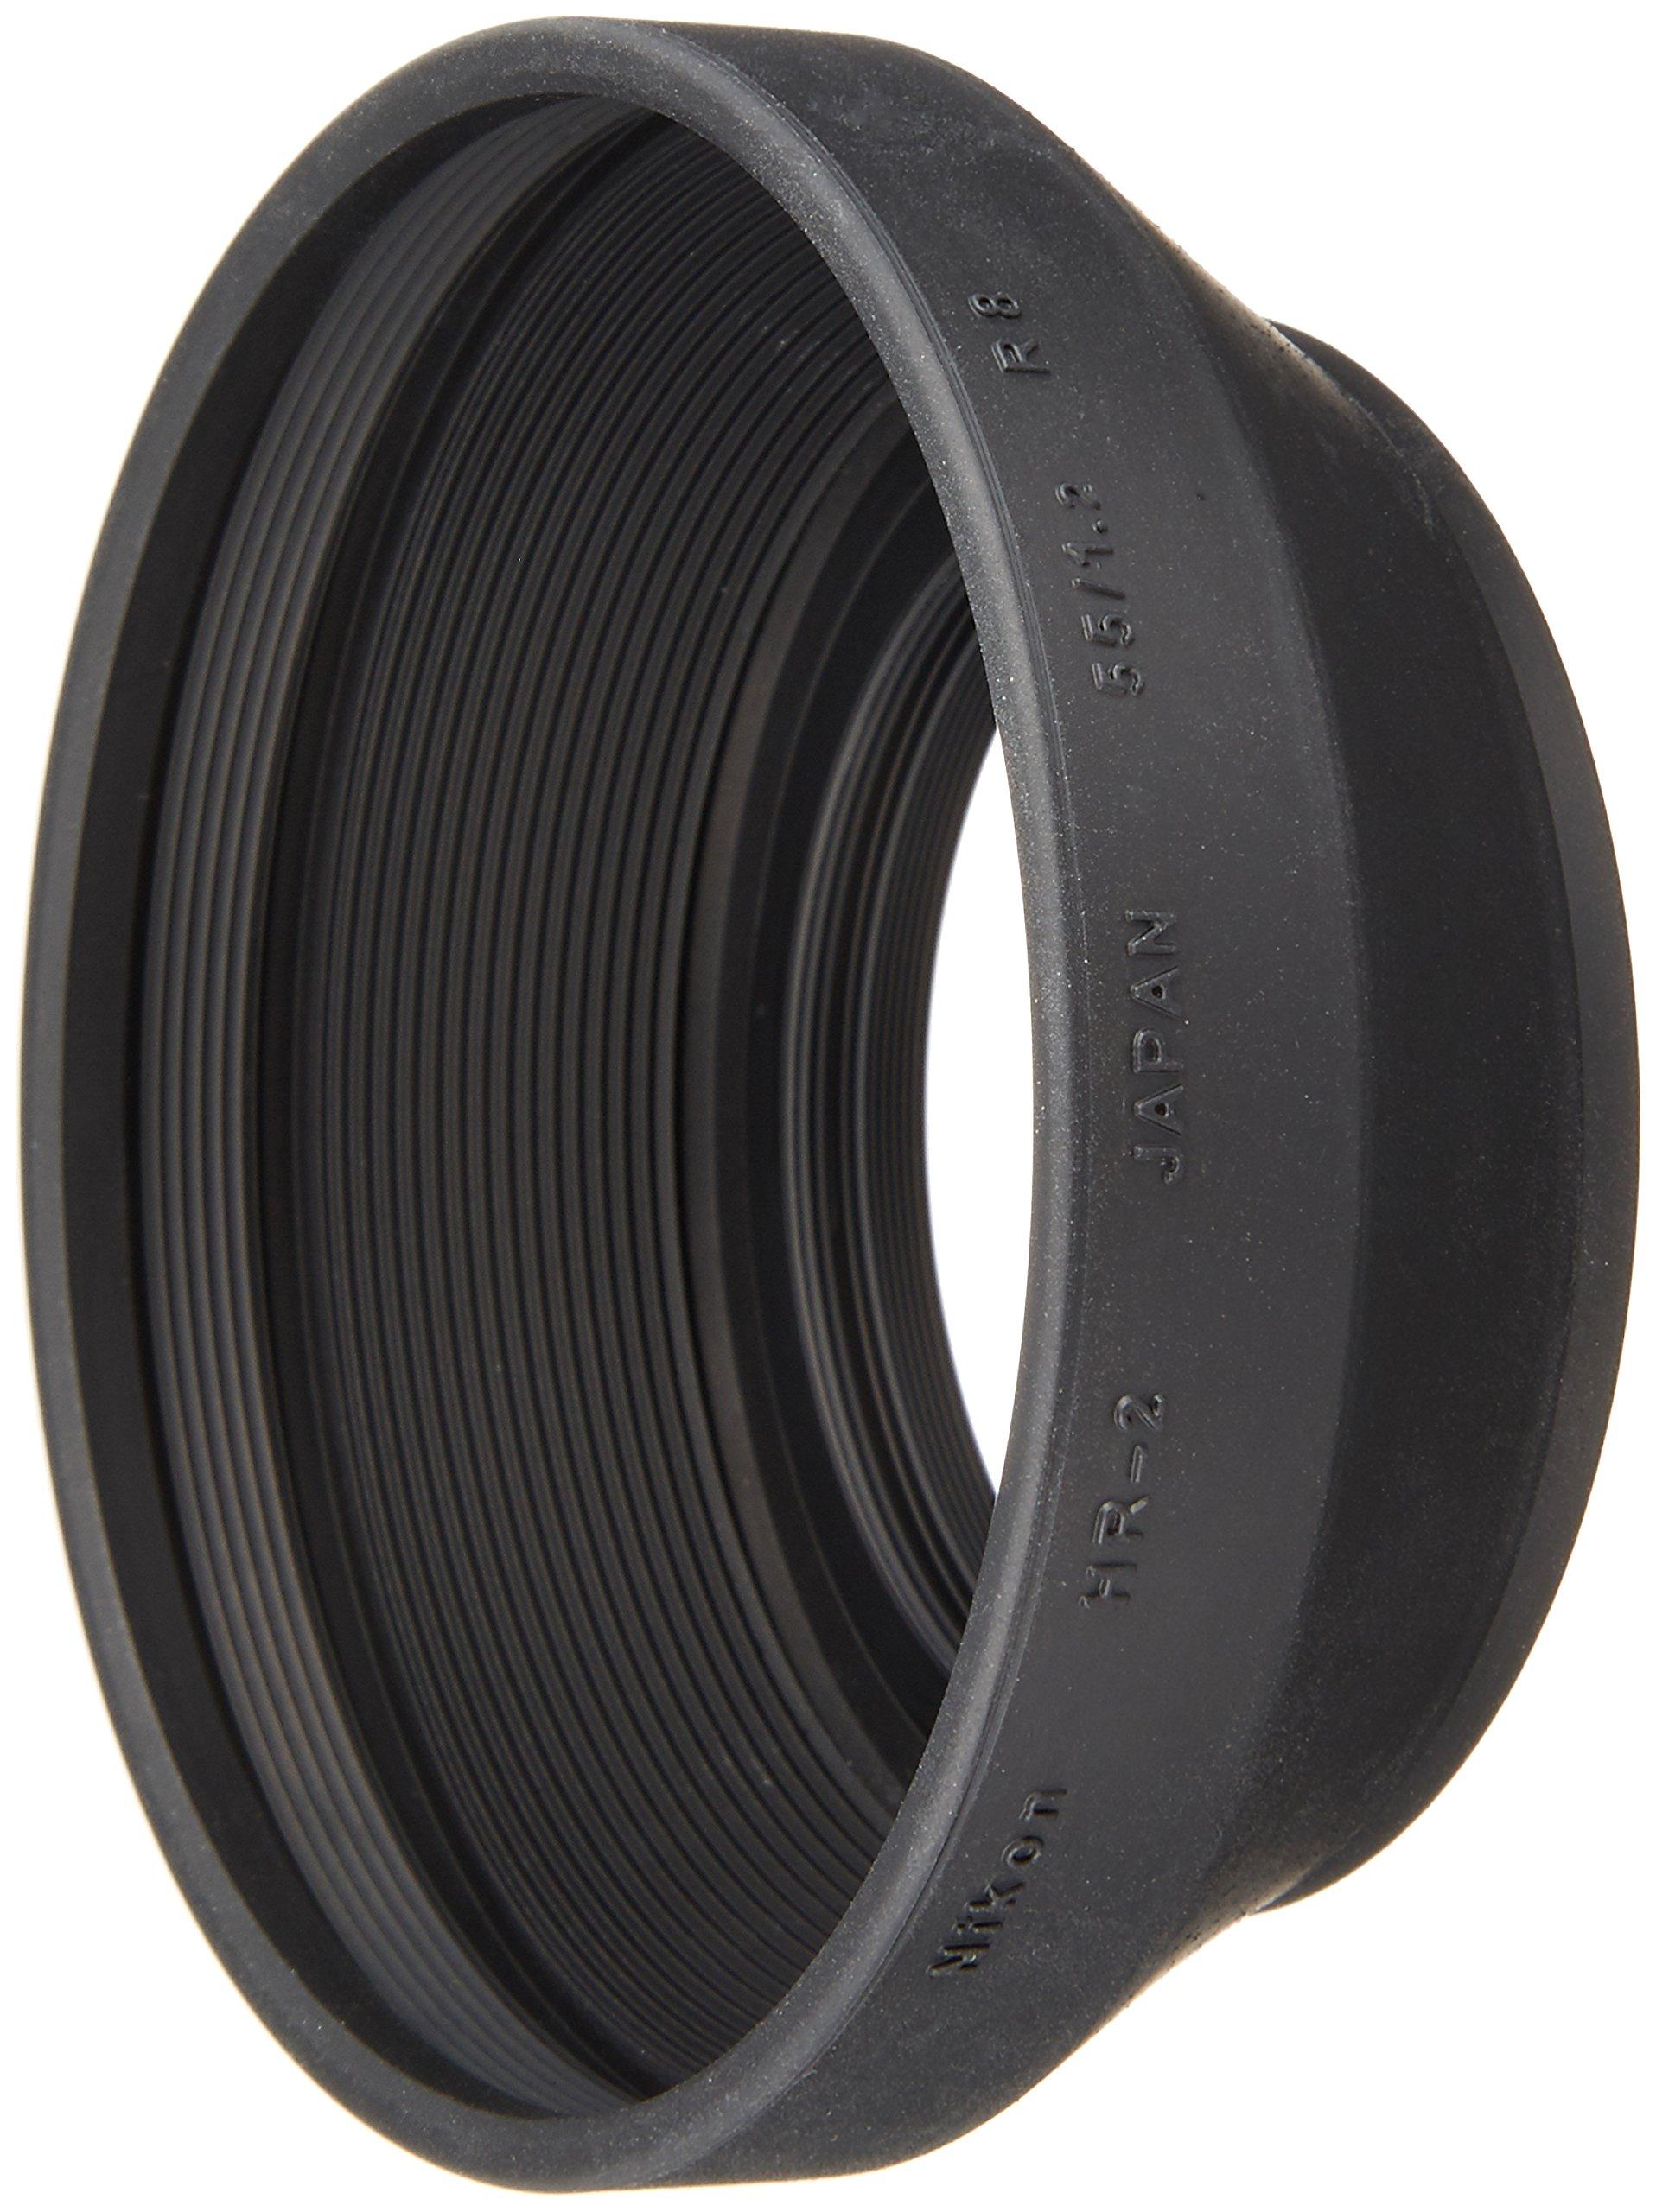 NIKON Rubber Hood for 50mm Lens by Nikon